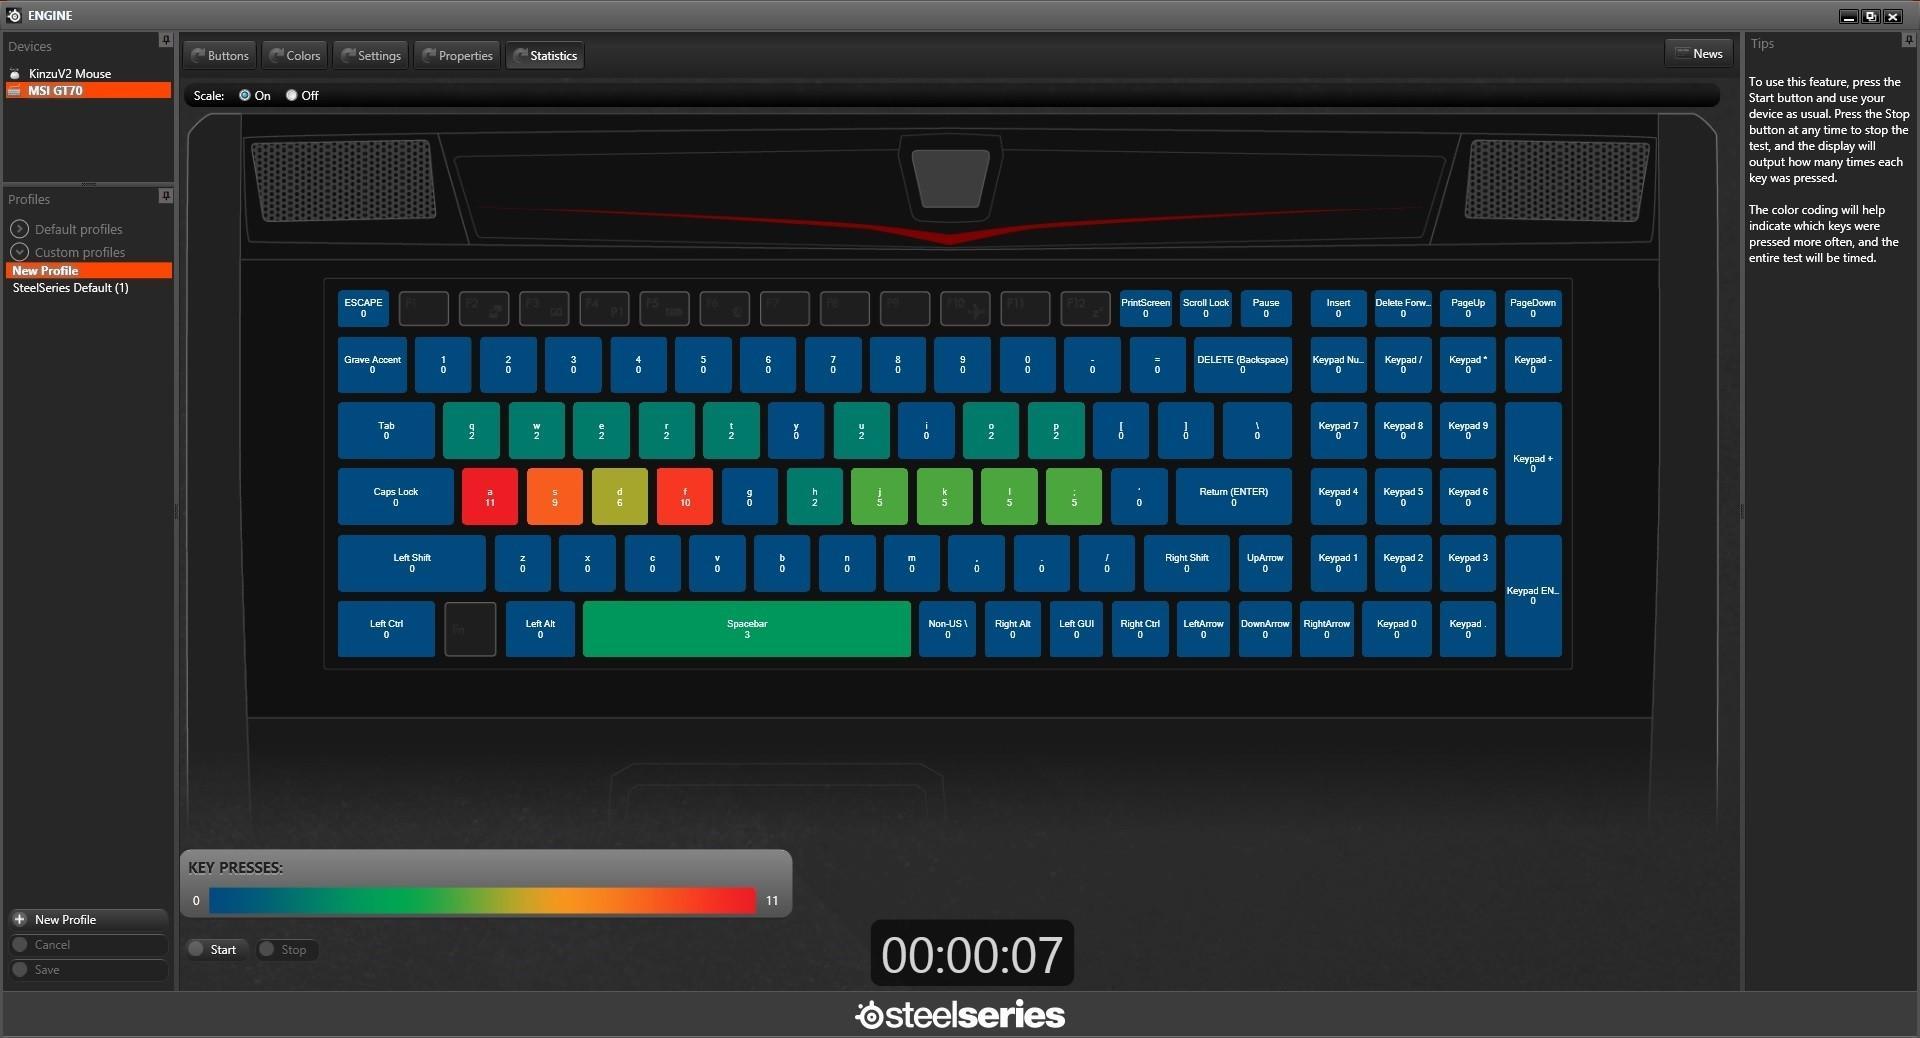 MSI_Keyboard_Customization_Gamecasting_02